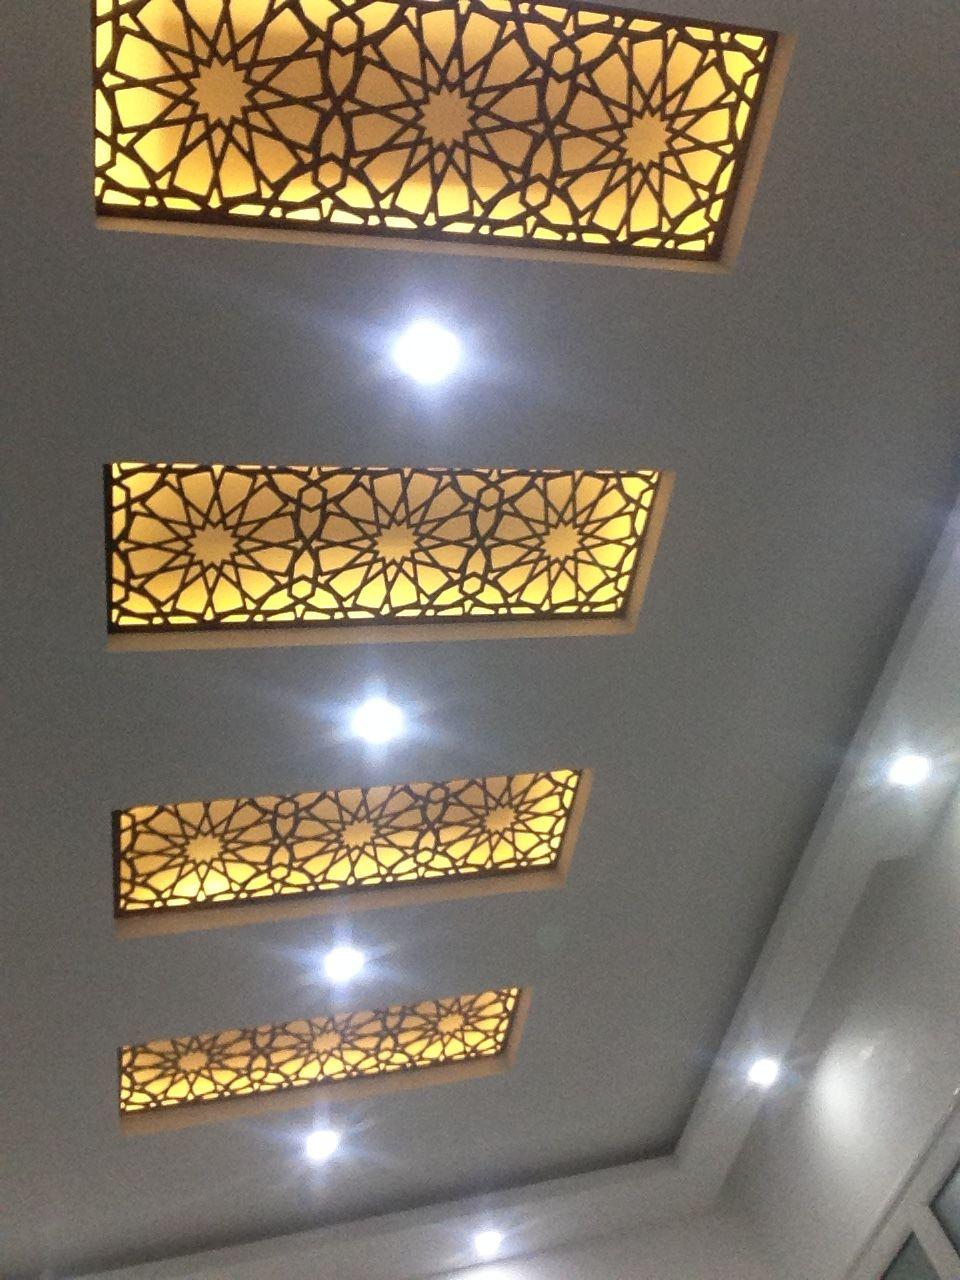 Pin By Toufik Jamil On Pop False Ceiling Design Ceiling Design   False Ceiling Designs For Staircase   Simple   Interesting   Square   Entrance Lobby   Decor